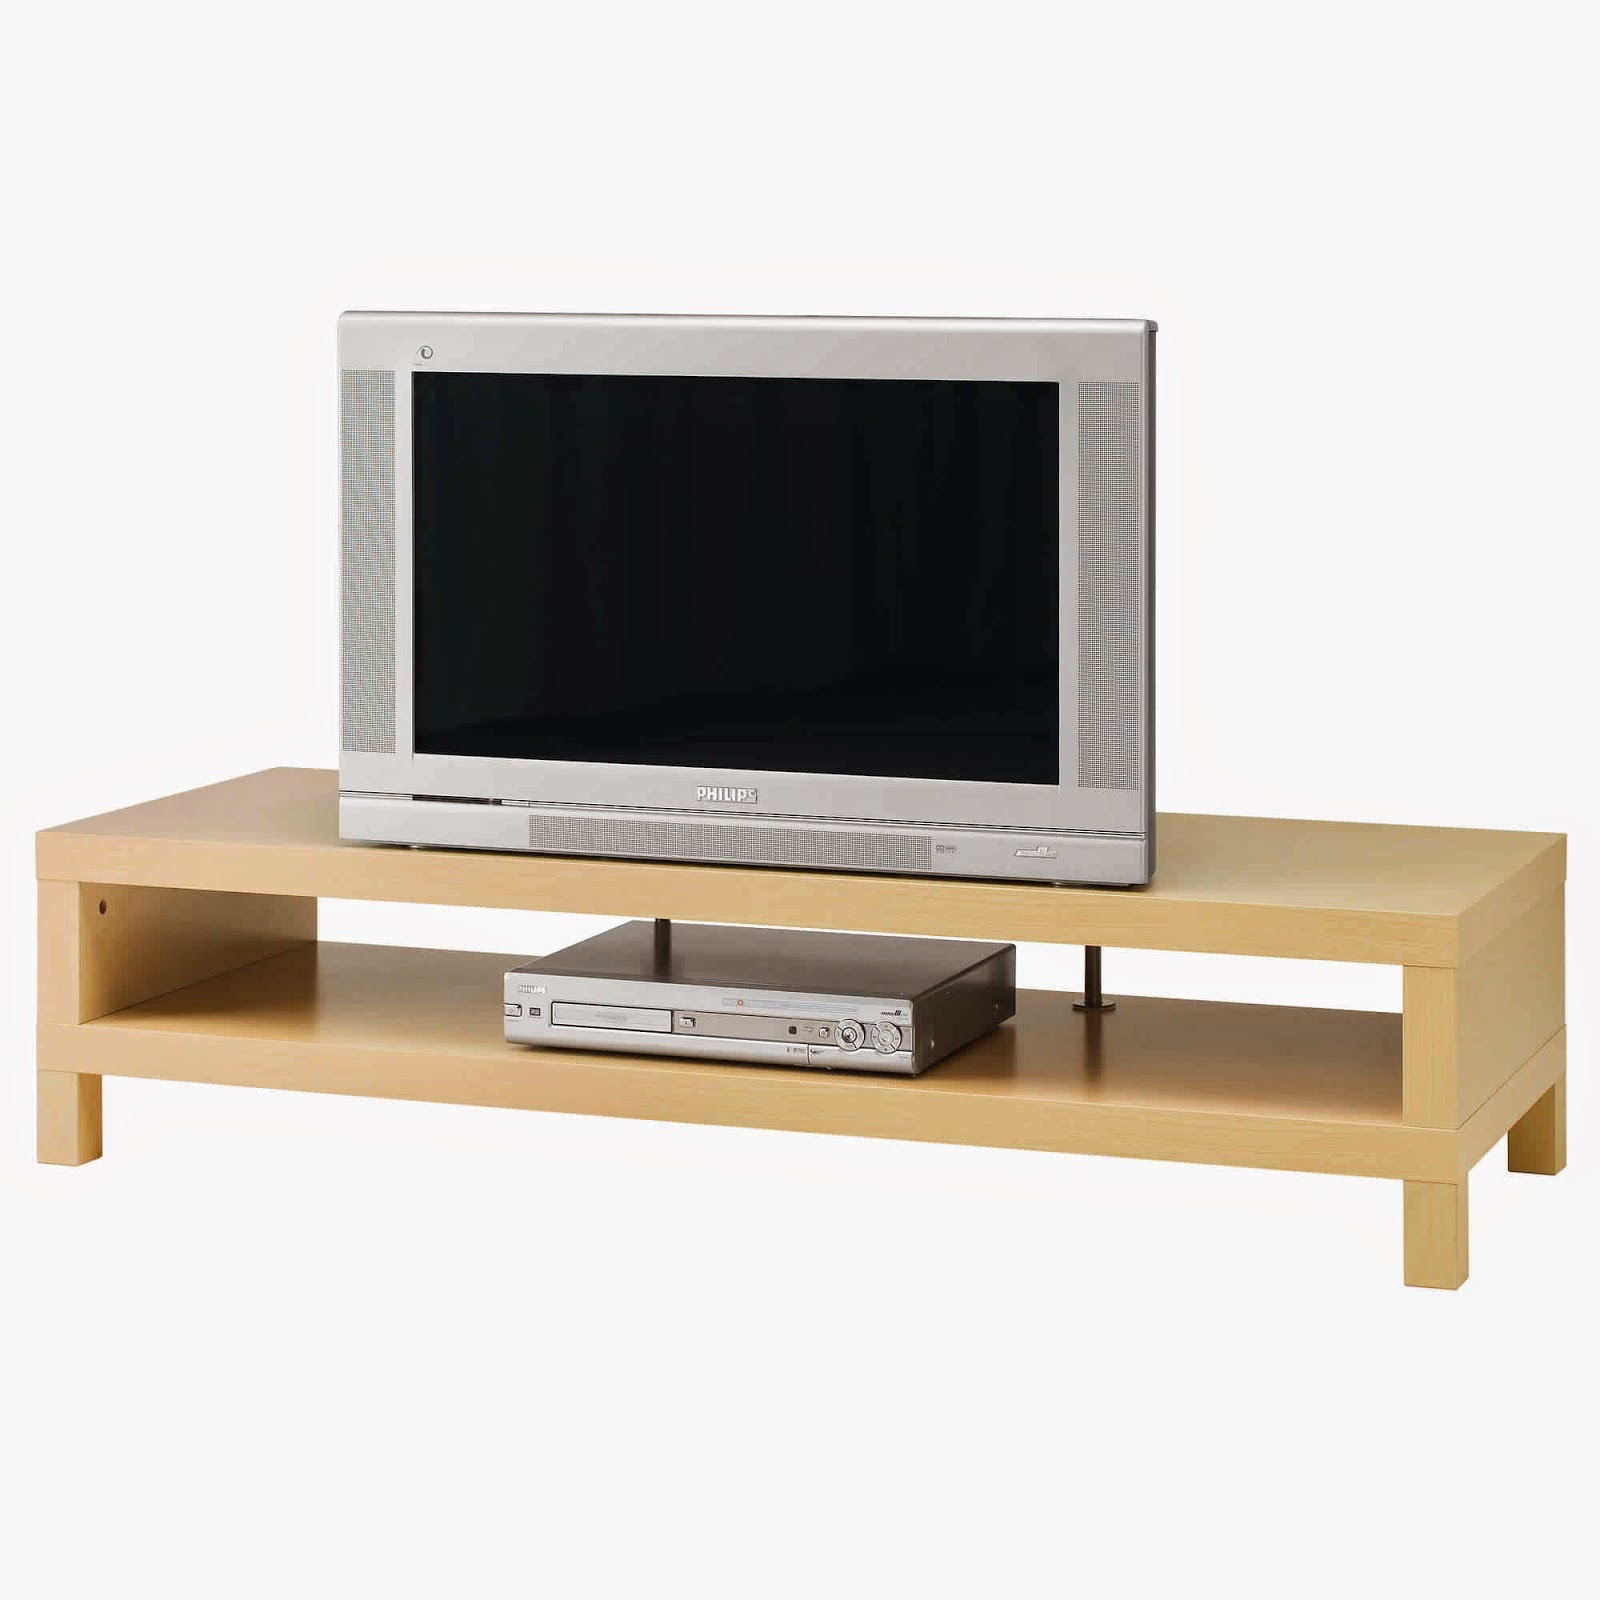 ikea meuble de tv meuble tv escamotable ikea meuble tv ikea meuble tv hifi ikea meuble tv. Black Bedroom Furniture Sets. Home Design Ideas